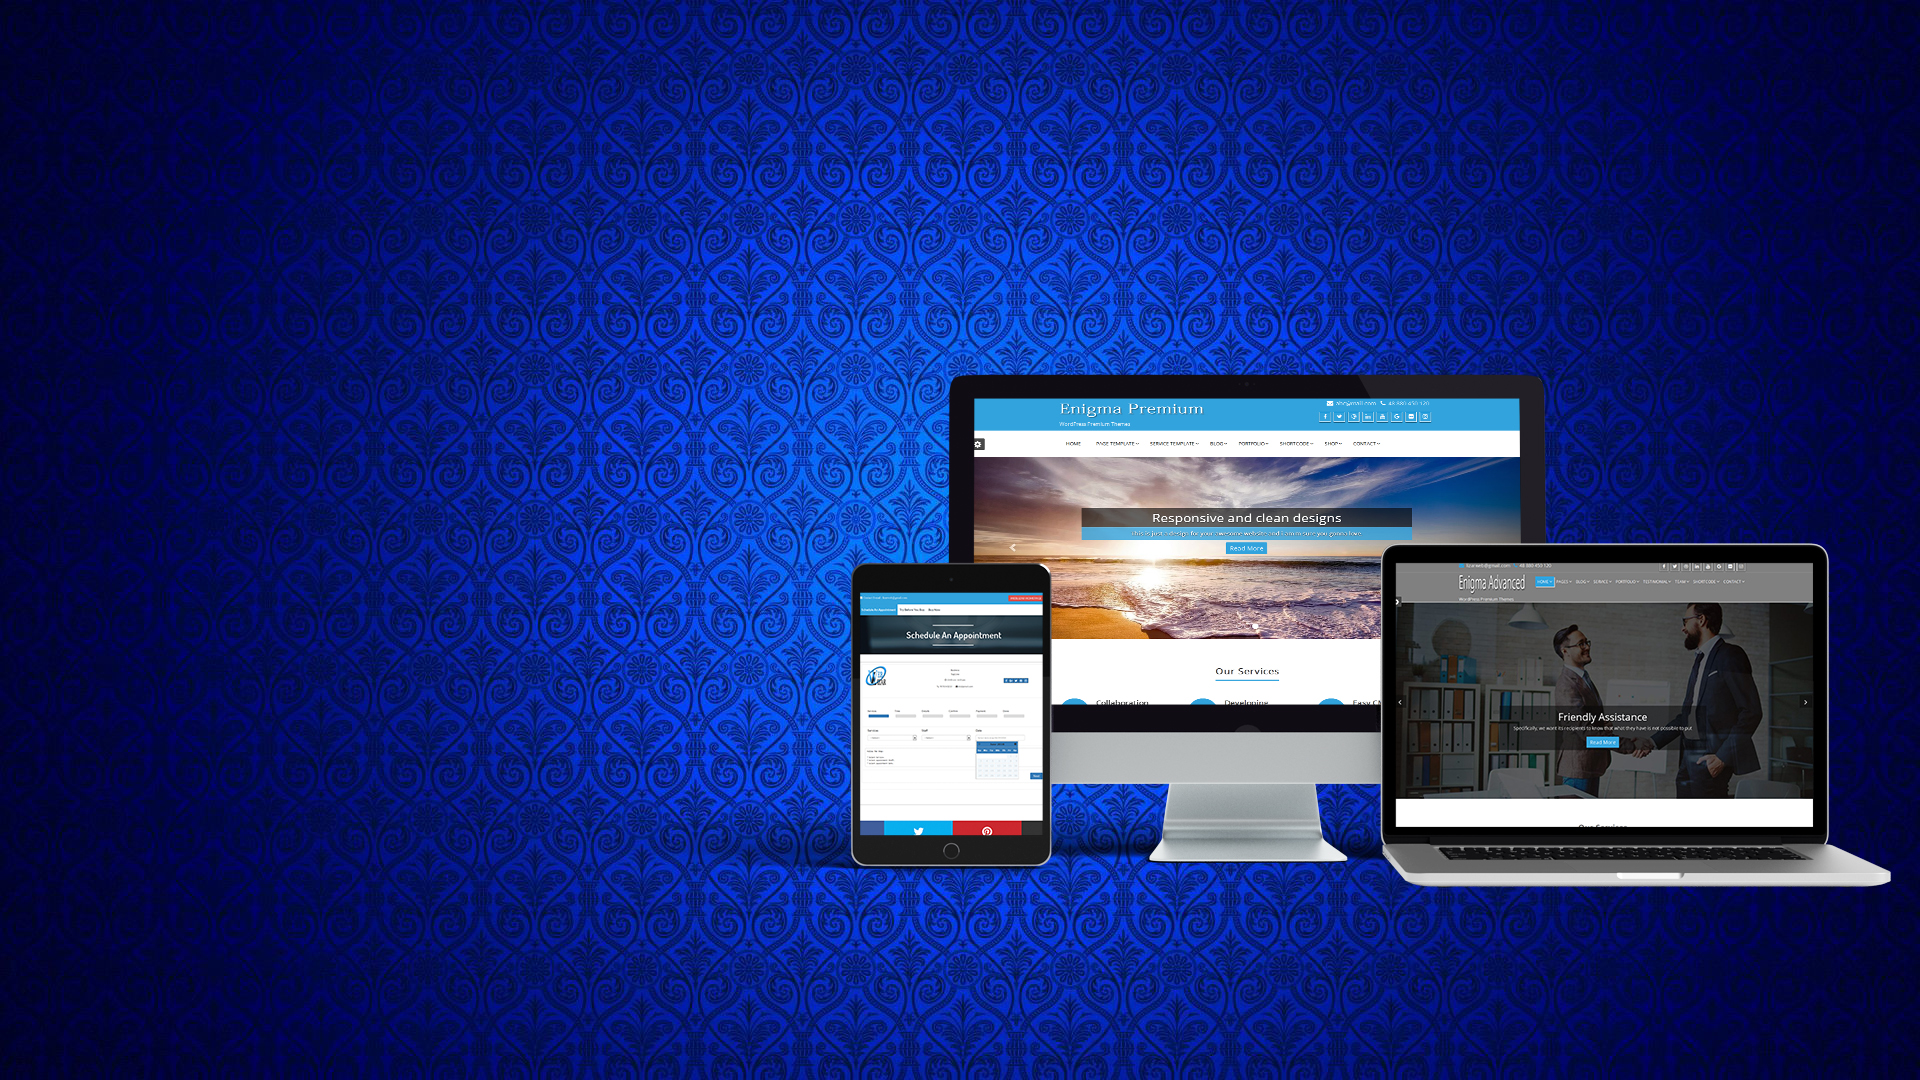 Weblizar Premium Themes And Plugins